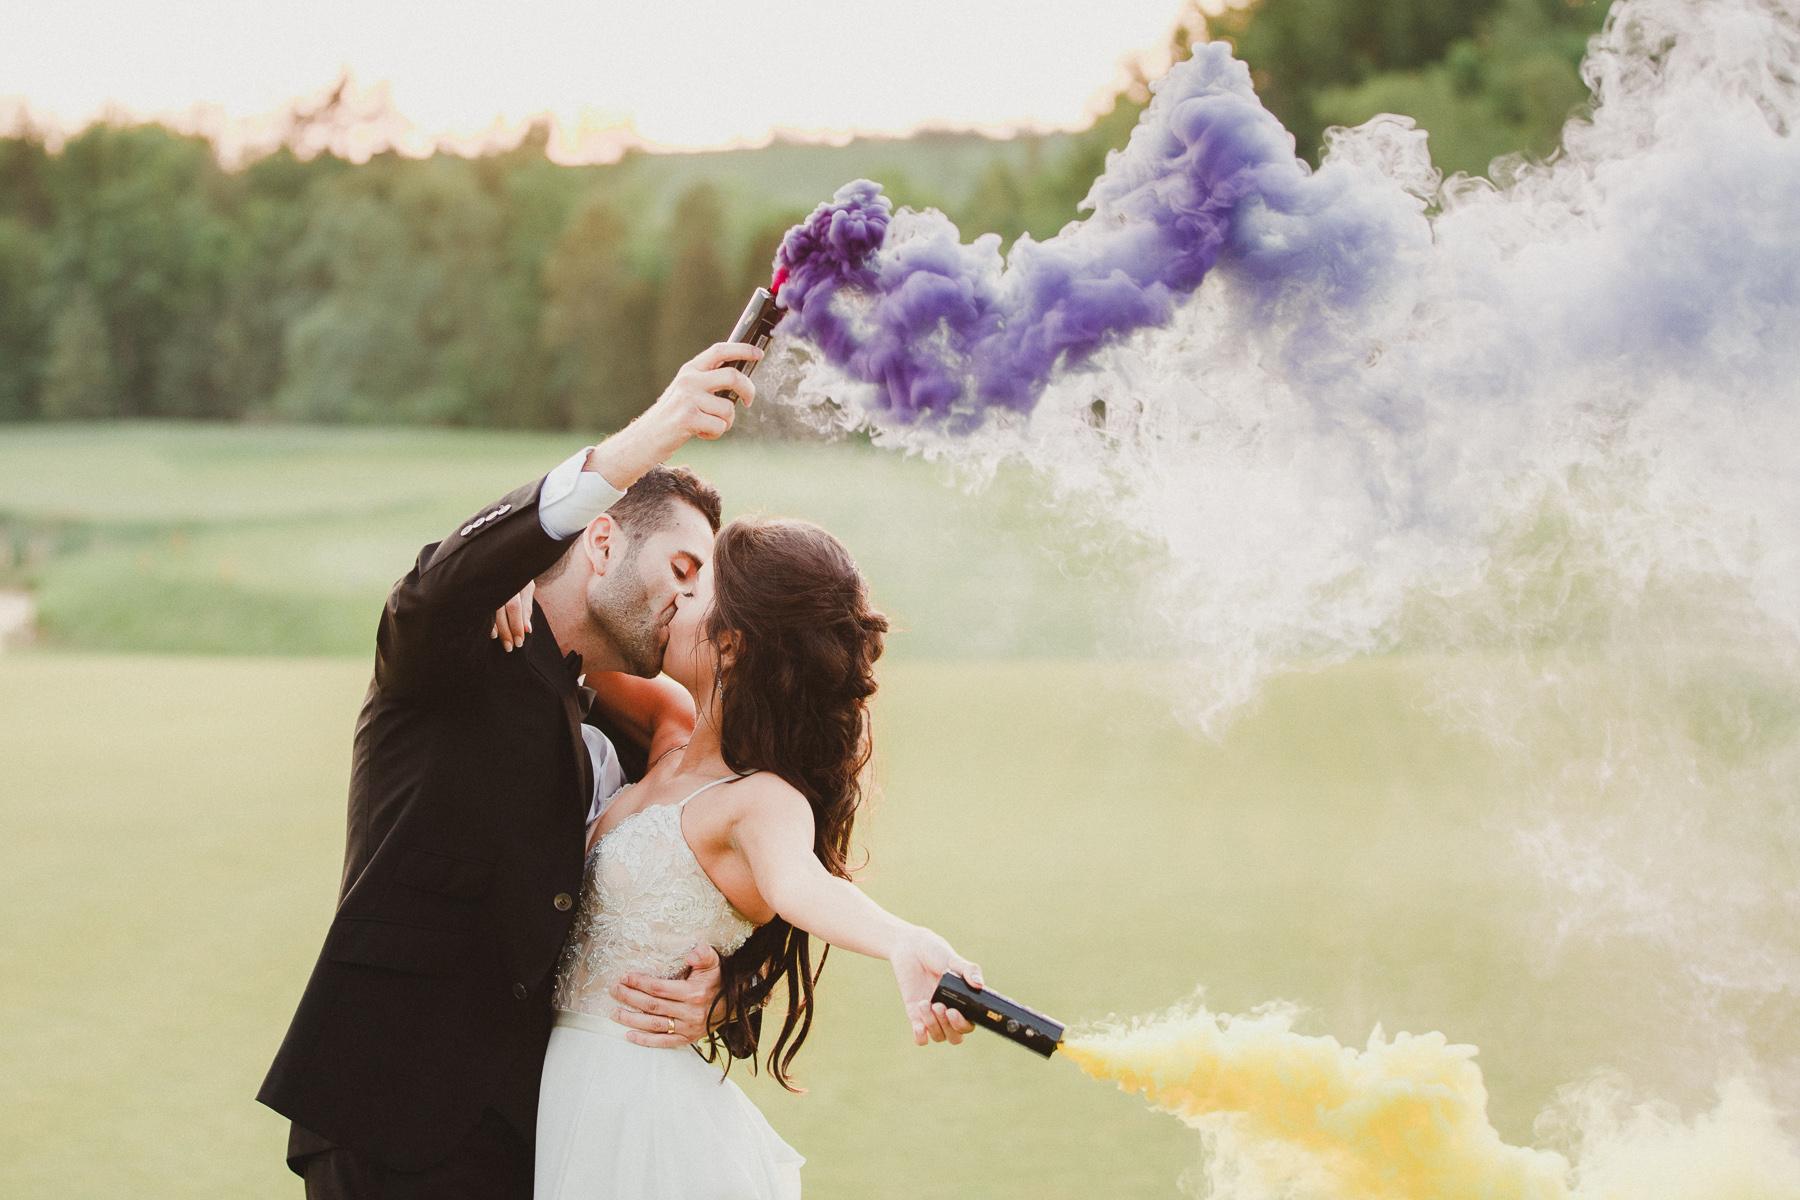 Eagles Nest Golf Club Wedding Photos by Top Toronto Wedding Photographer